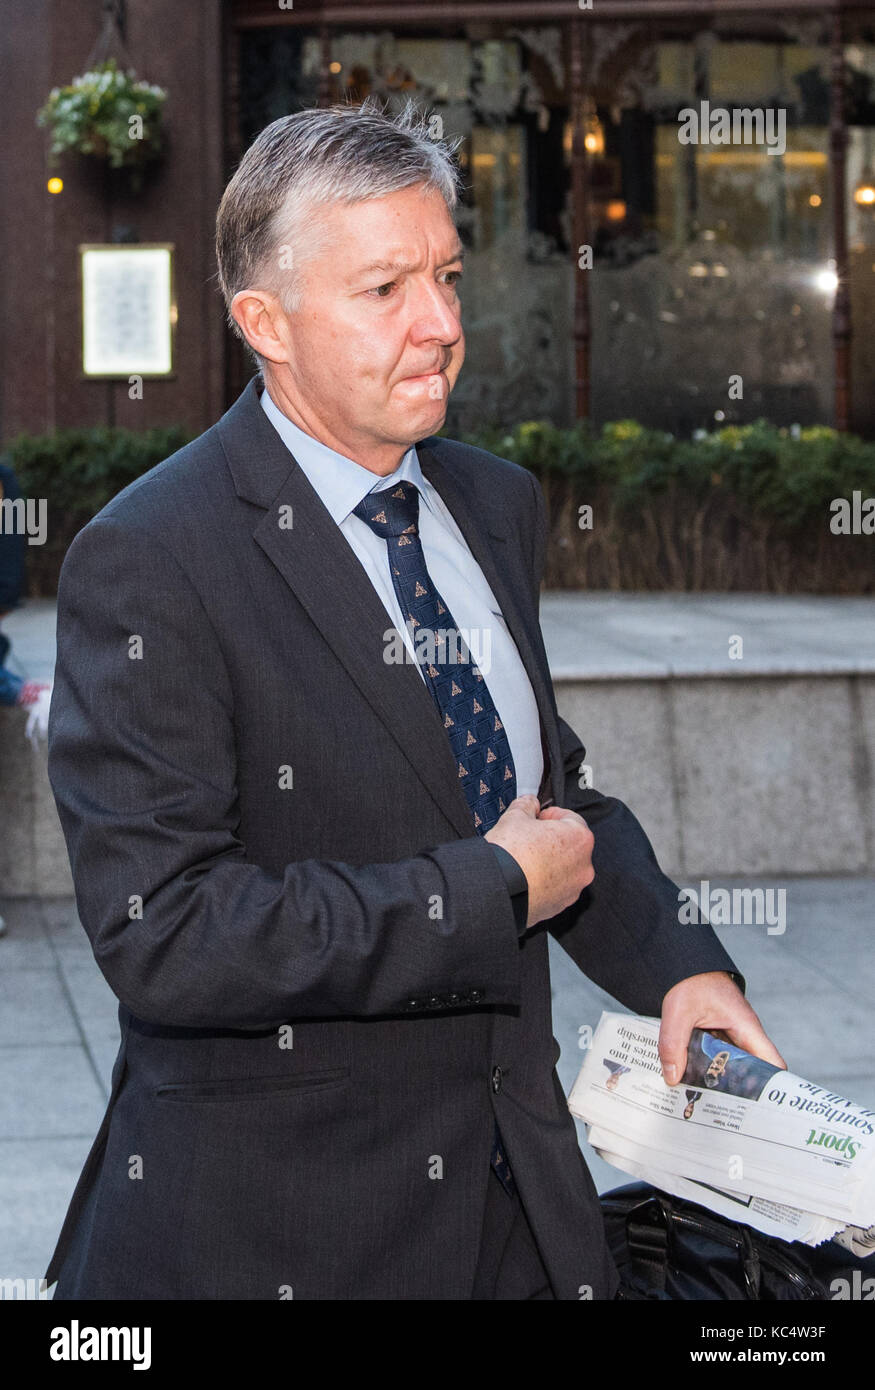 London, United Kingdom. 03rd October 2017. Transport for London Commissioner Mike Brown arrives at TfL headquarters, - Stock Image